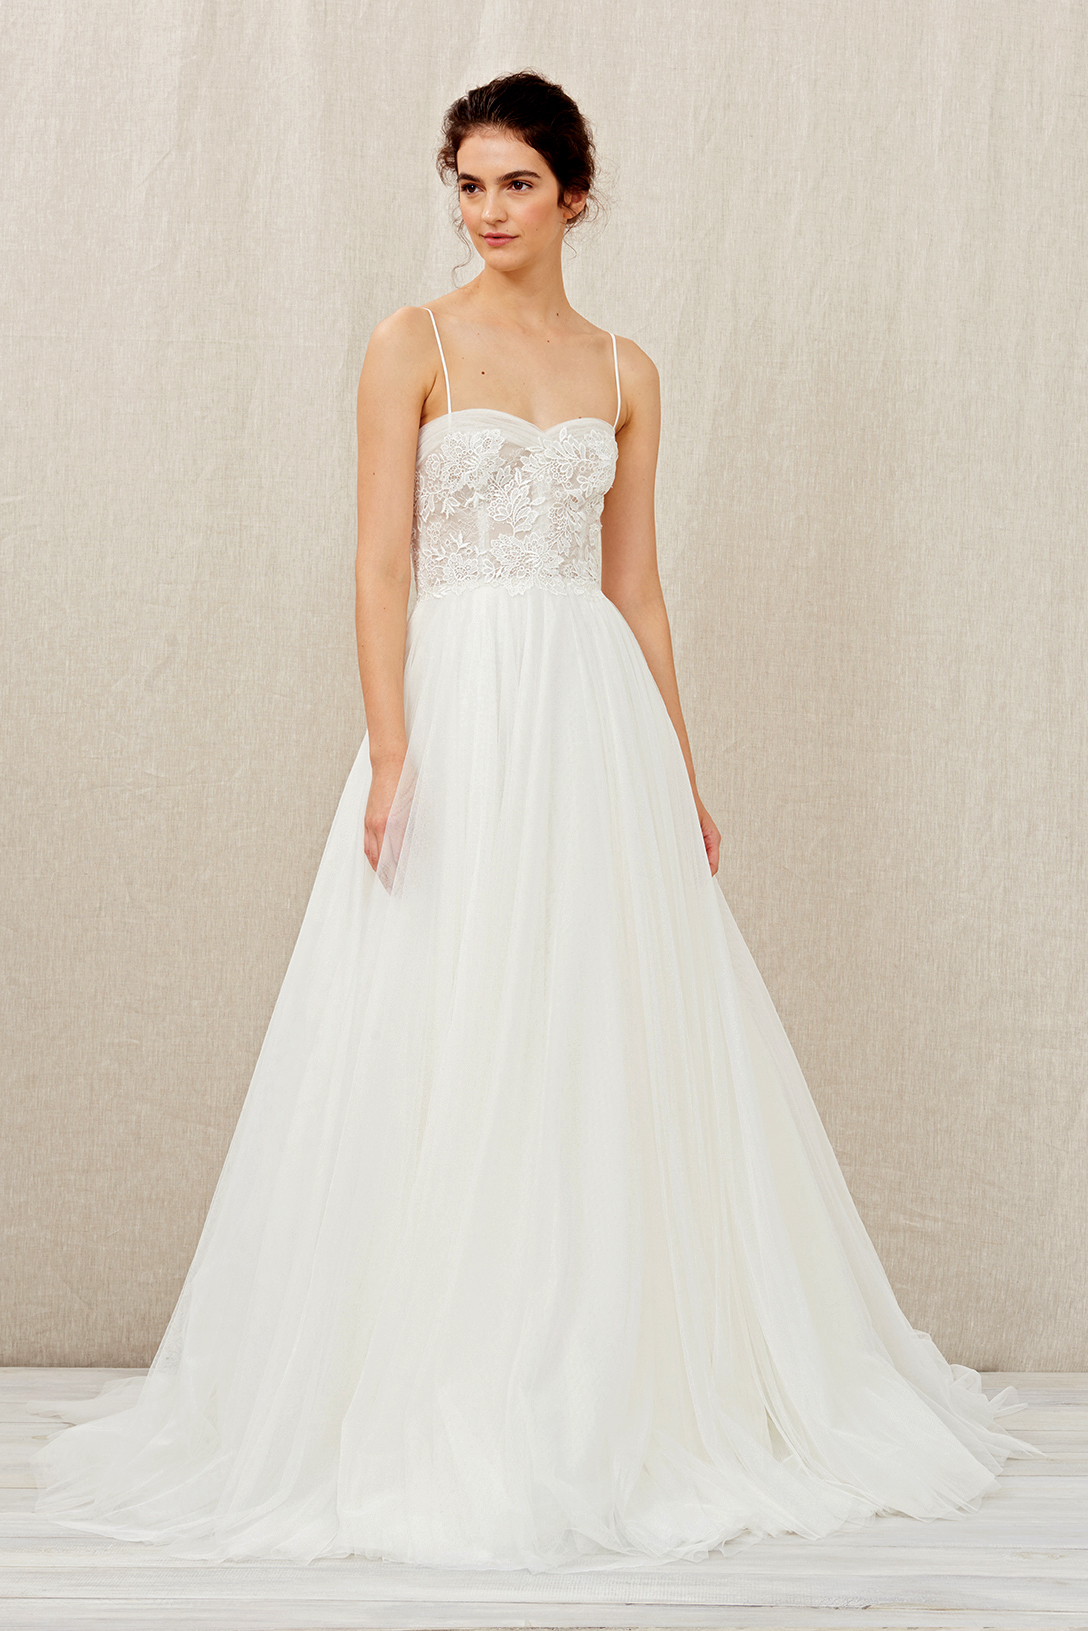 Christos Fall 2018 Wedding Dress Collection Martha Stewart Weddings